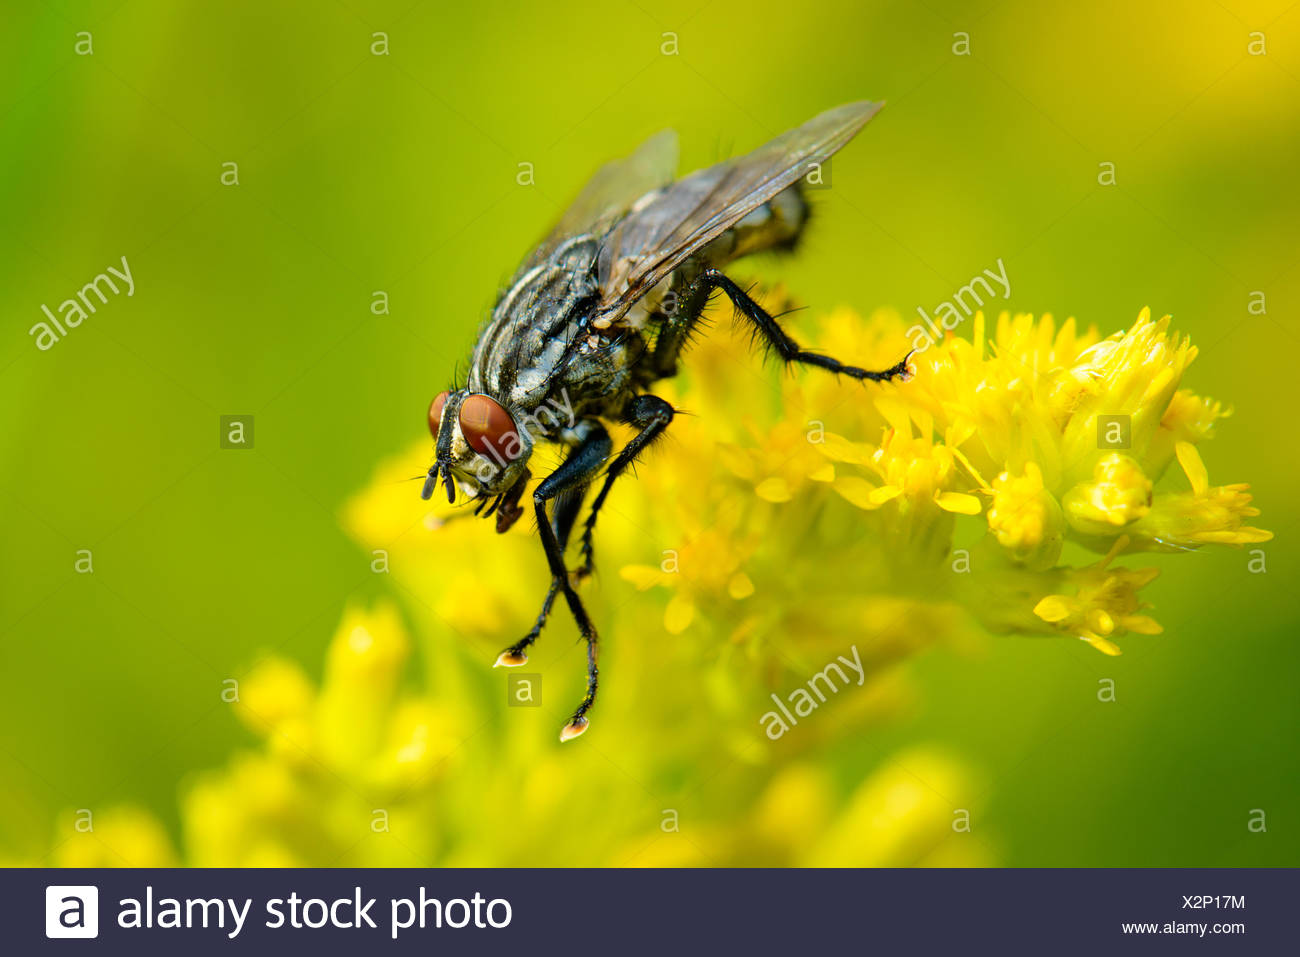 Common Flesh Fly Stock Photo